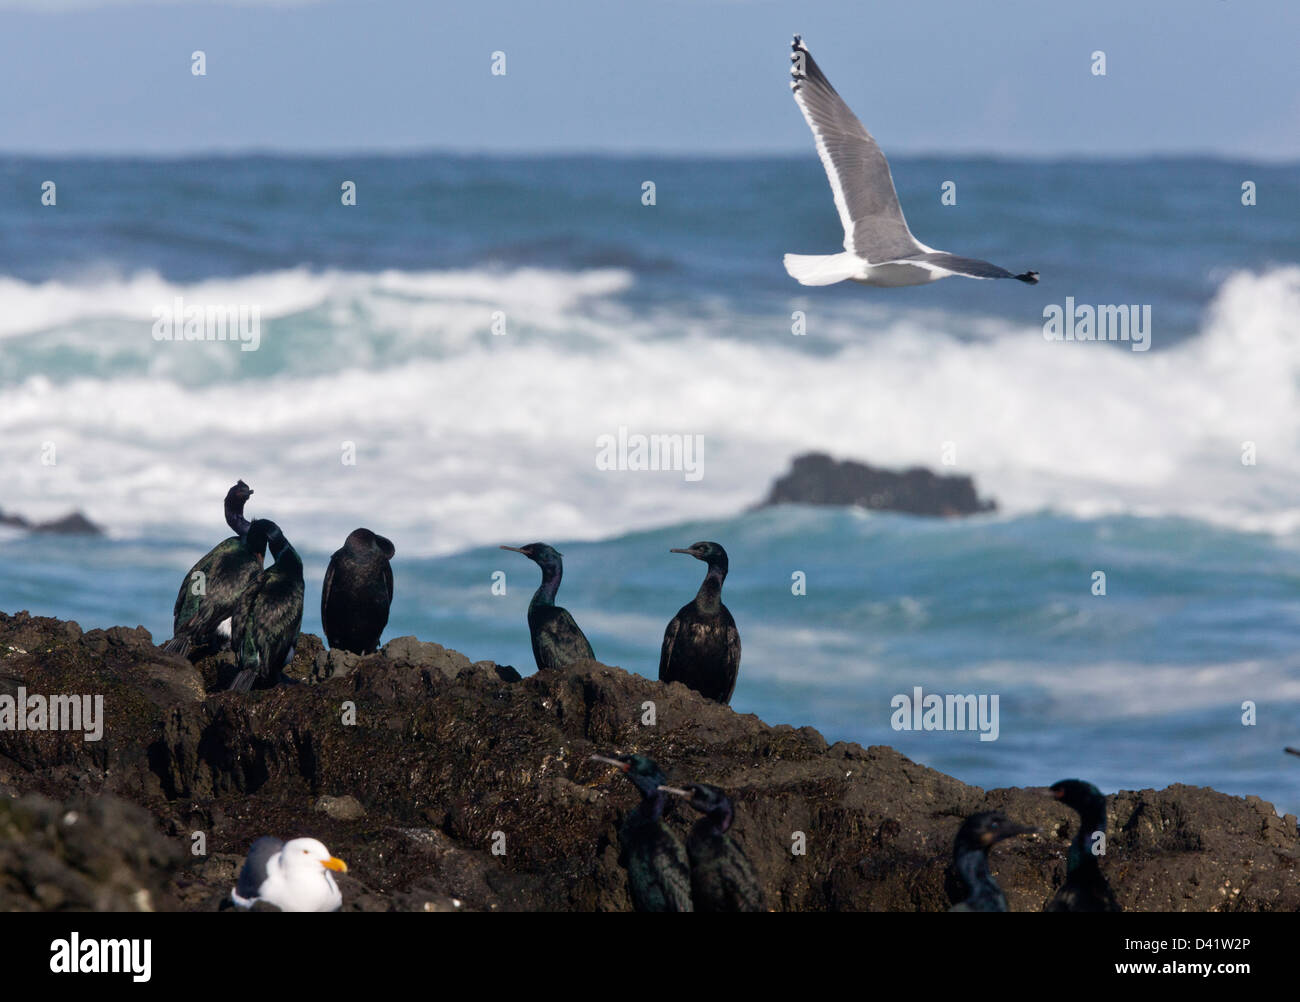 Pelagic Cormorants (Phalacrocorax pelagicus) on rocks by the sea, with Western Gull, MacKerricher State Park, California - Stock Image